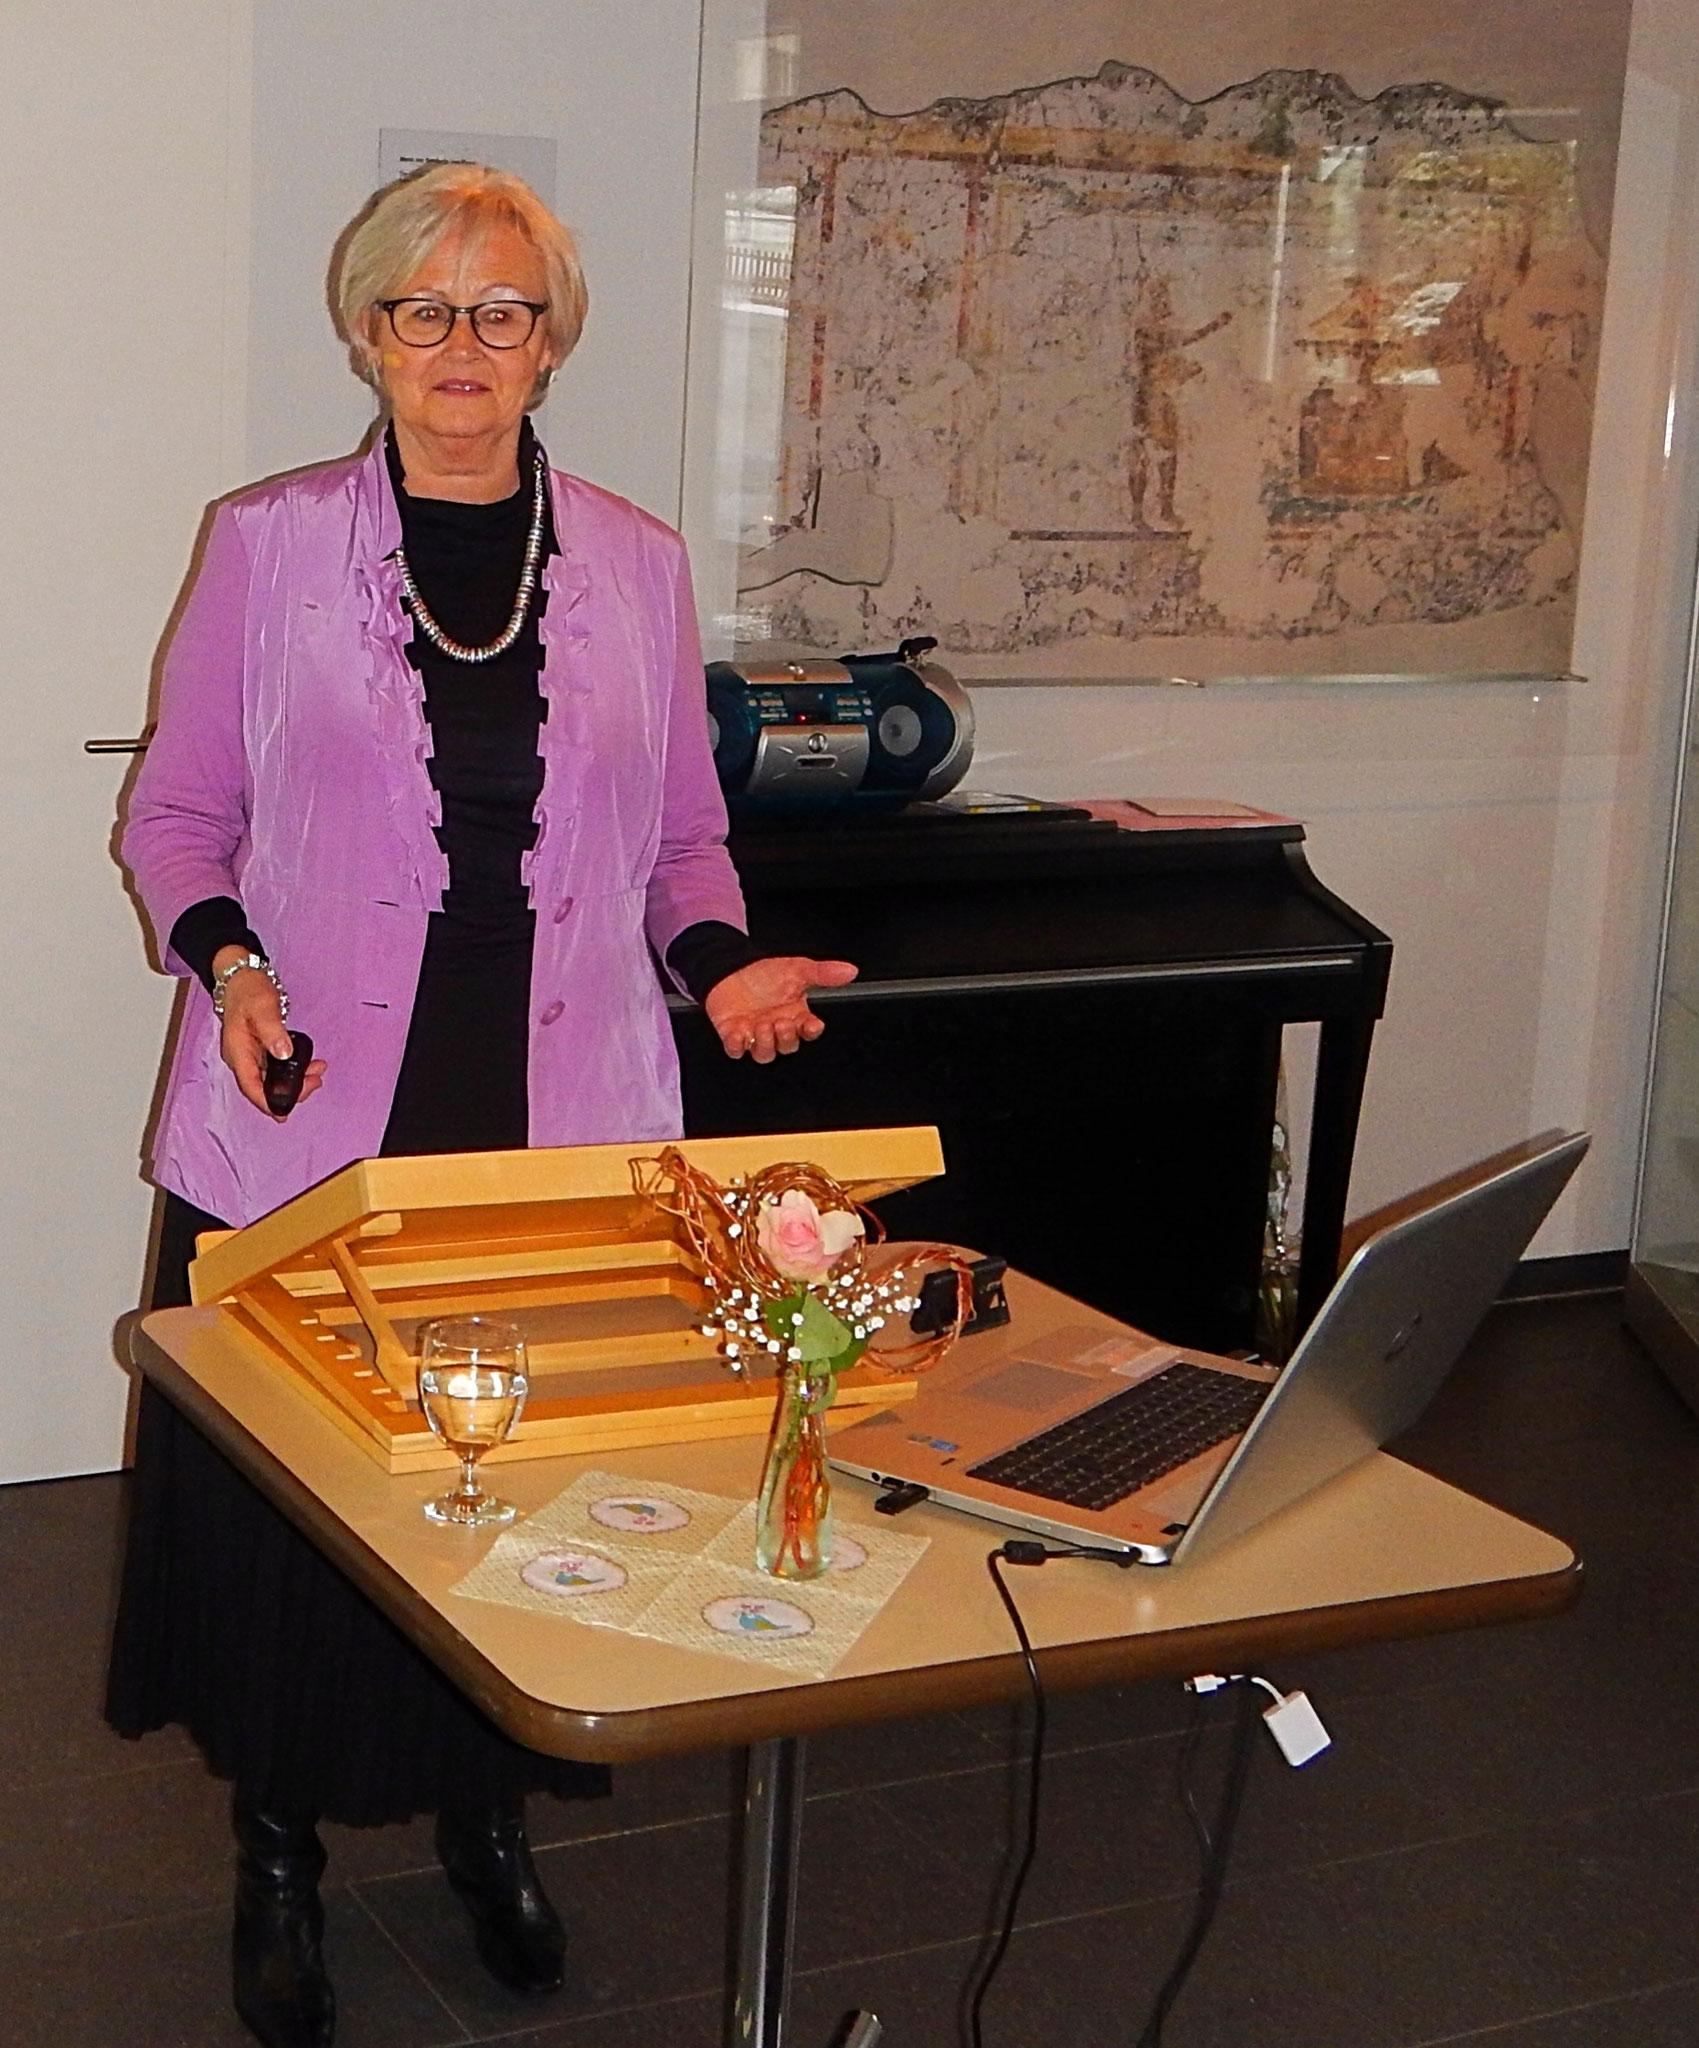 Frauenzmorge: die Referentin Frau Lotti Schum